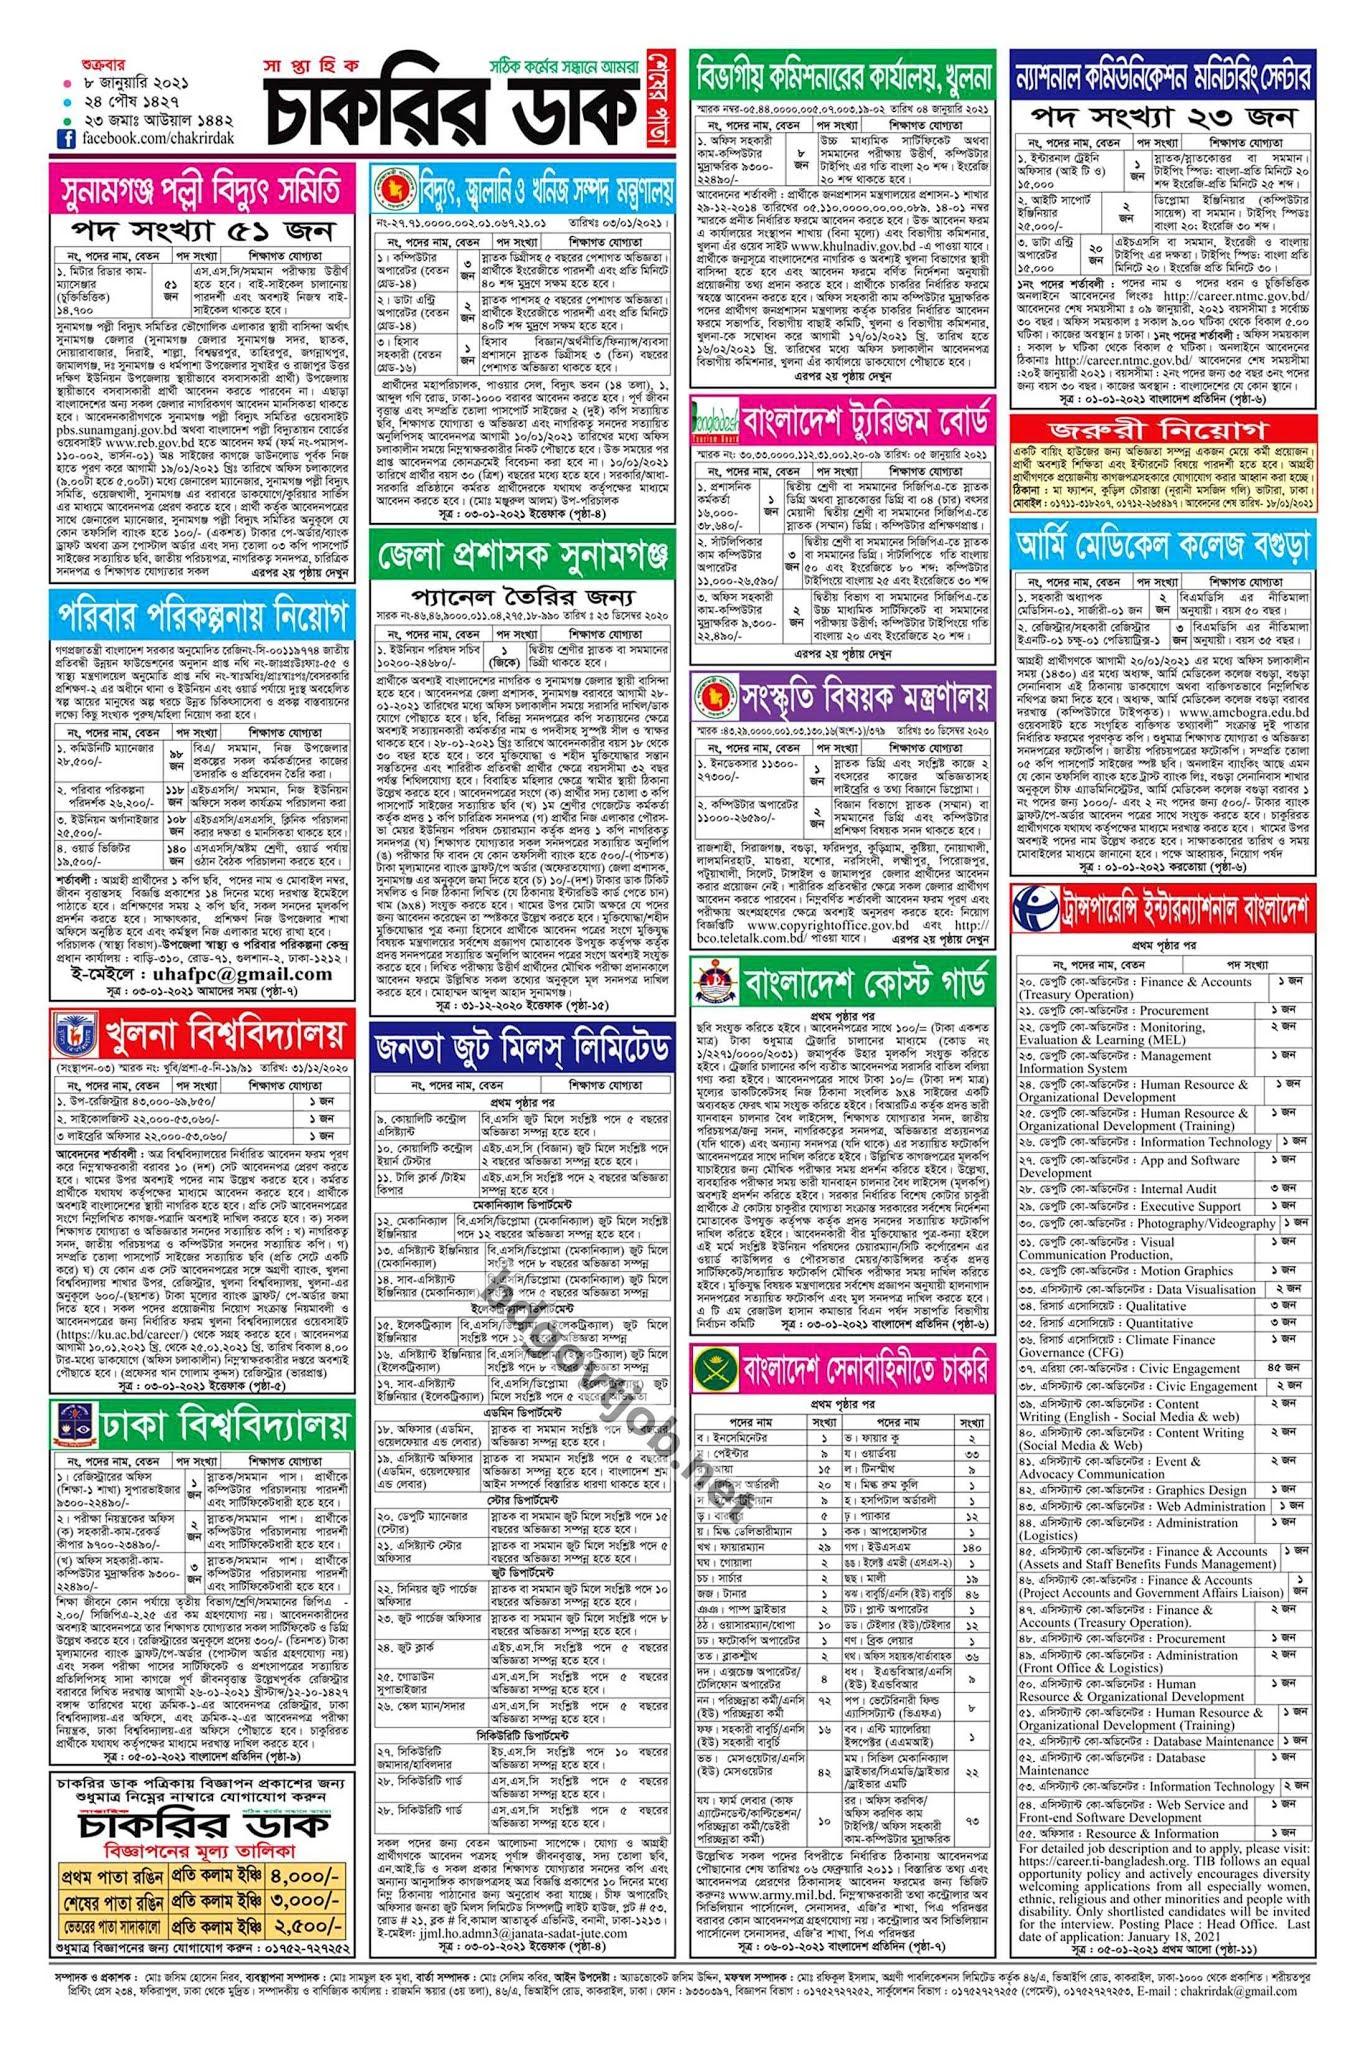 saptahik chakrir dak potrika 15 january 2021 - সাপ্তাহিক চাকরির ডাক পত্রিকা ১৫ জানুয়ারি ২০২১